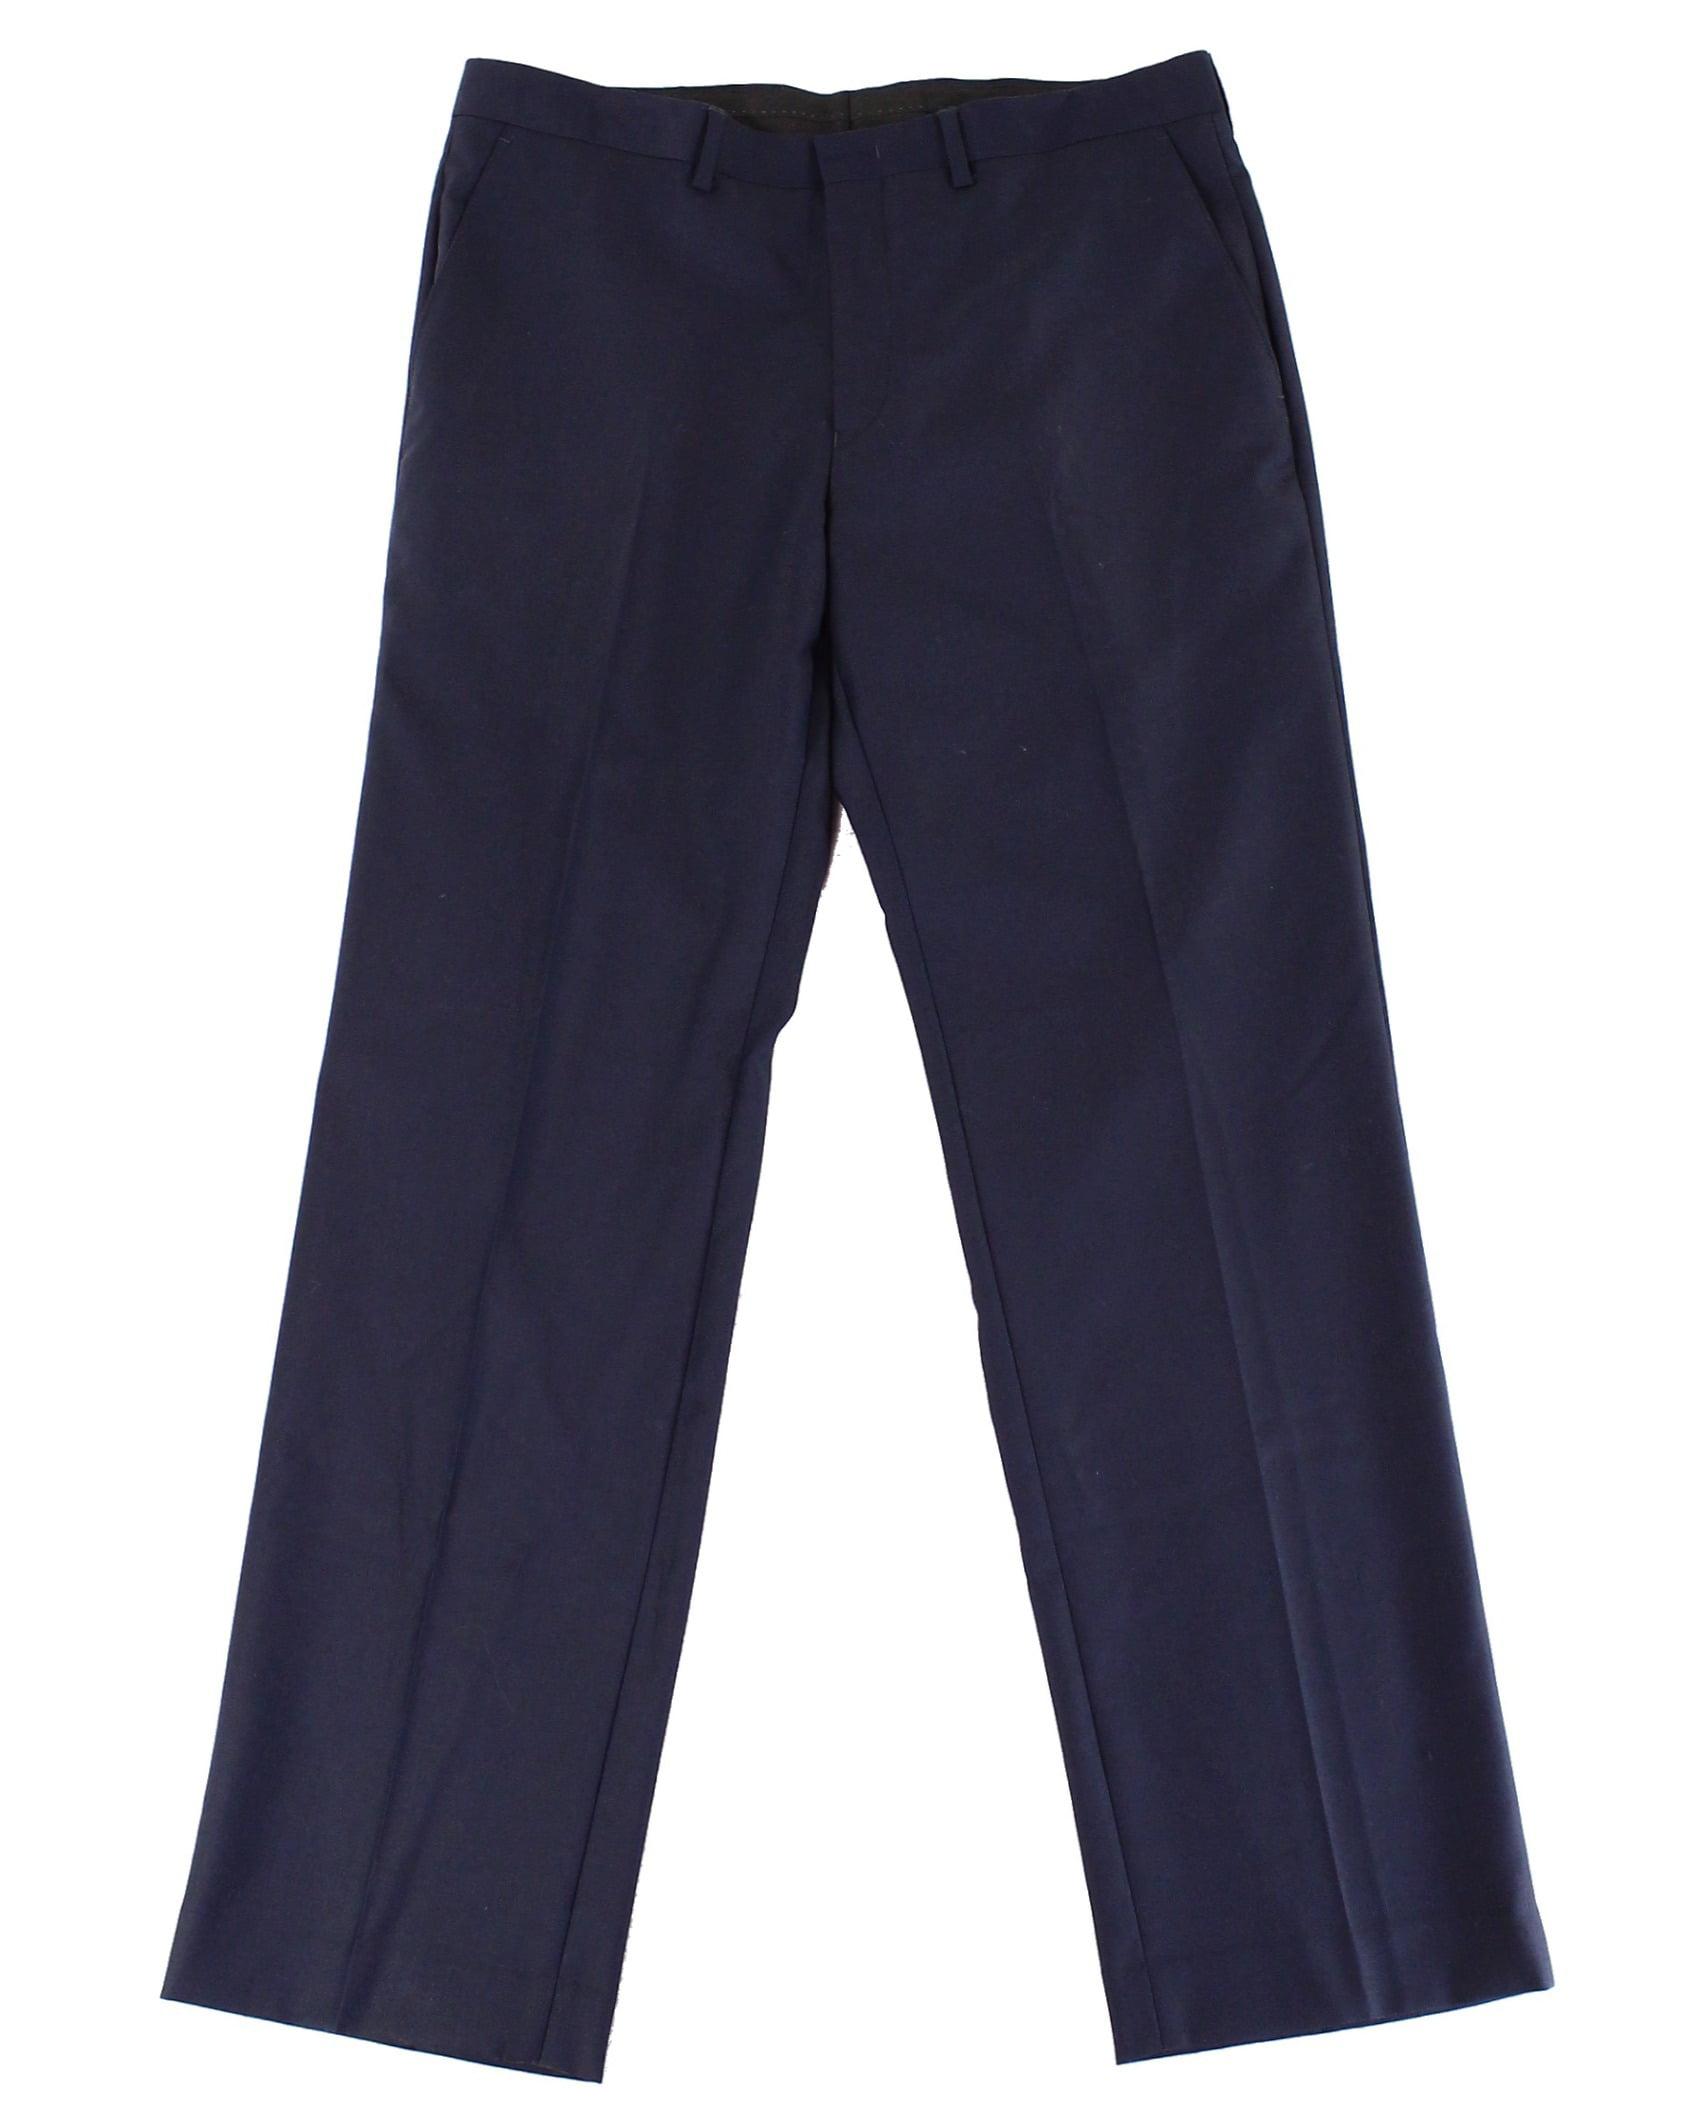 Mens 38X32 Dress - Flat Front Pants 38